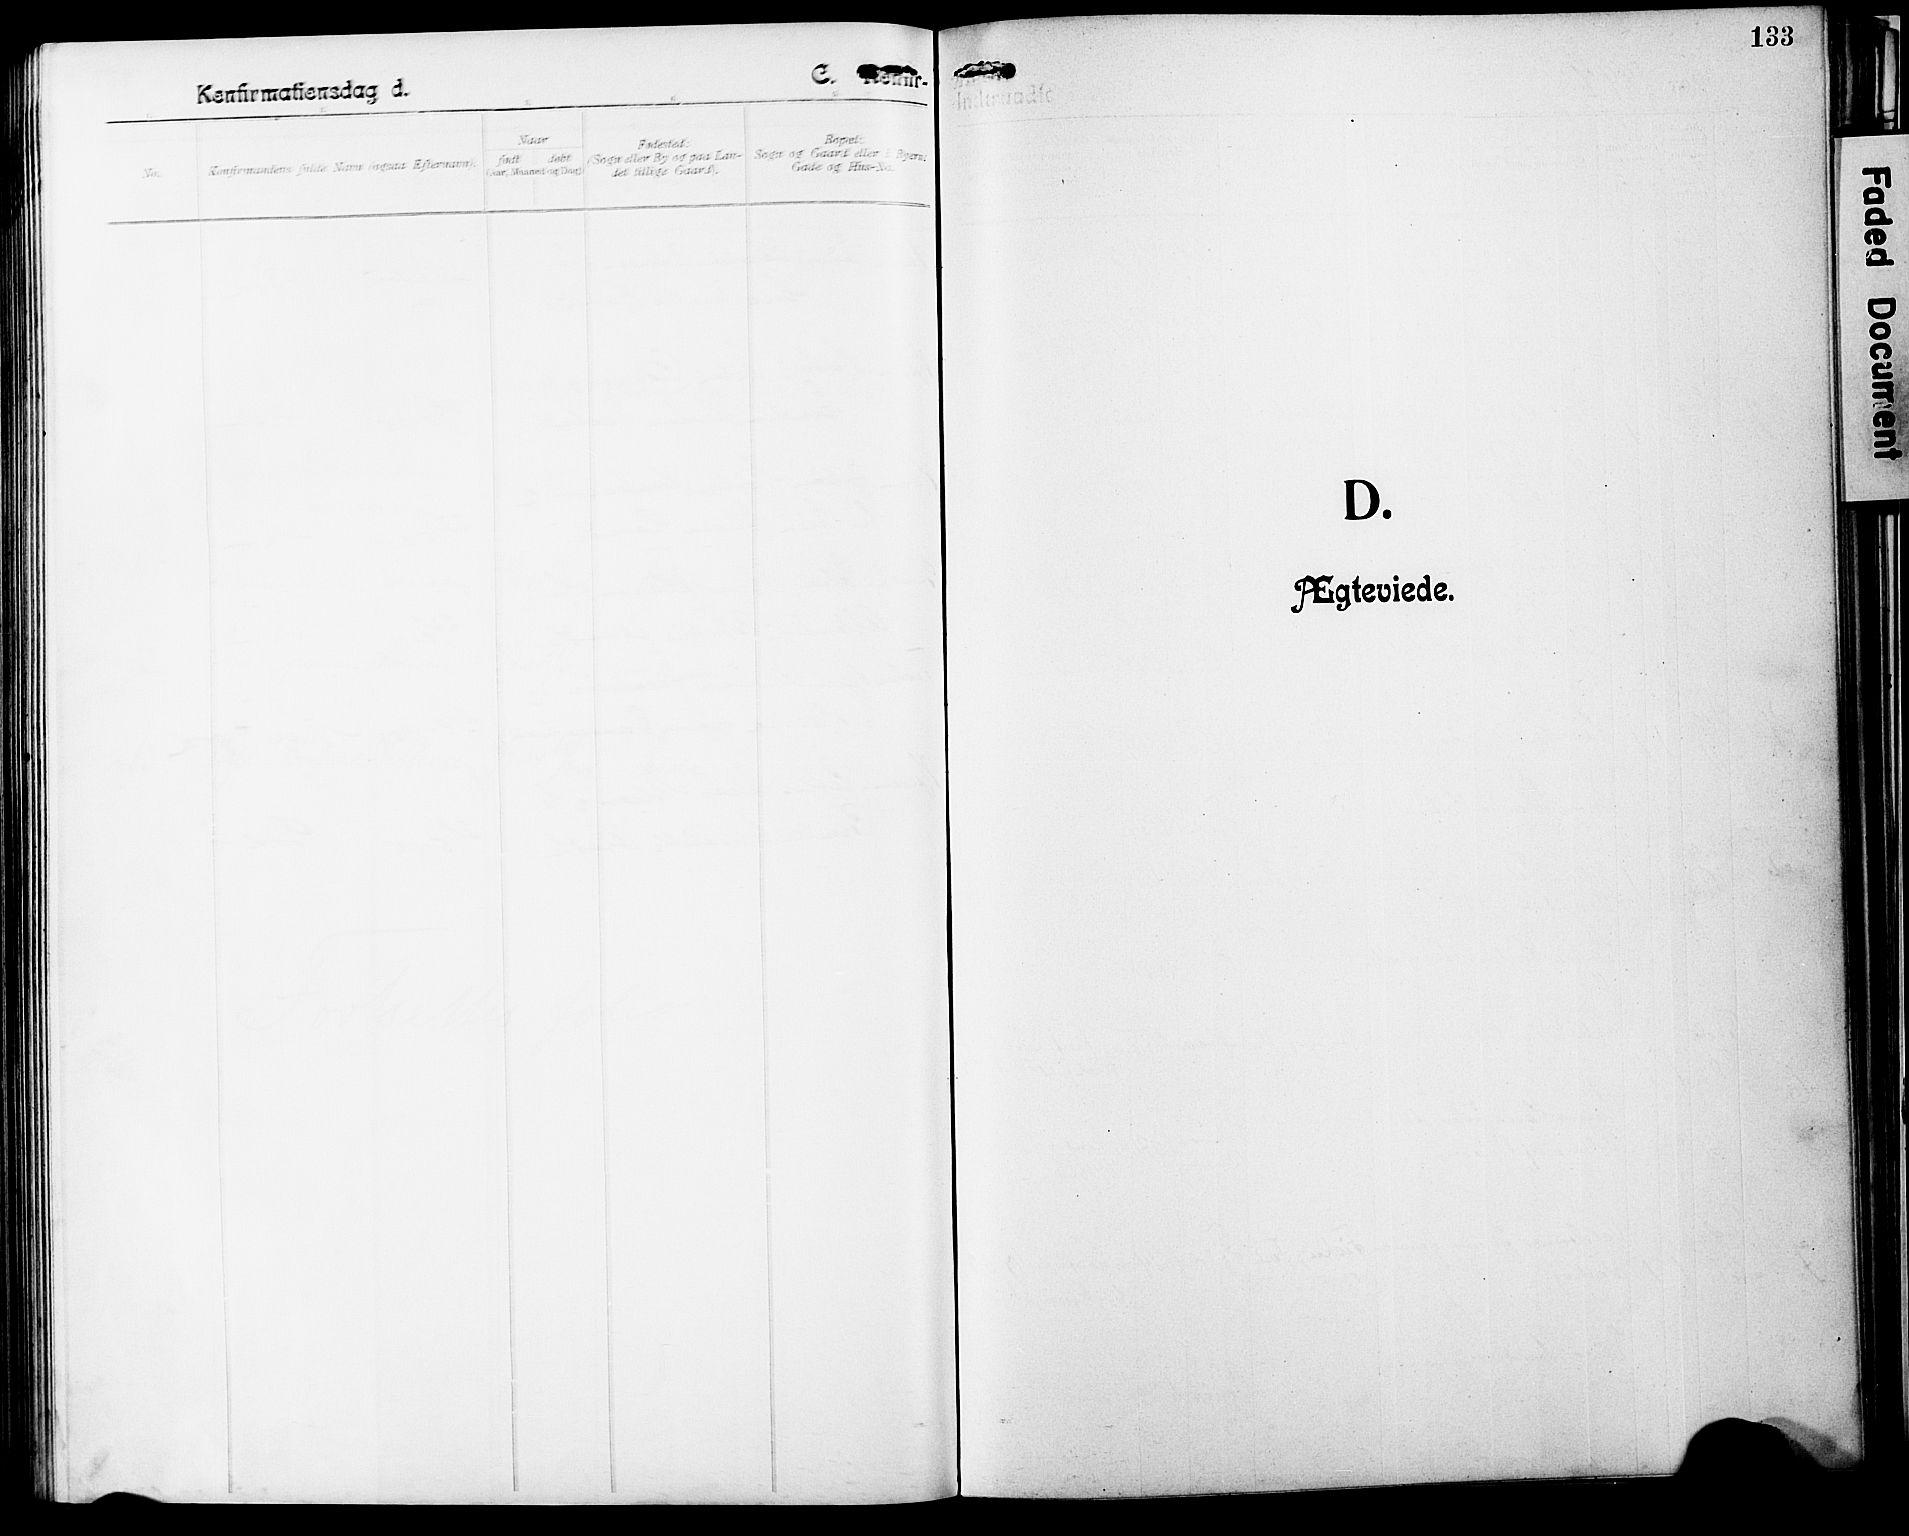 SAT, Ministerialprotokoller, klokkerbøker og fødselsregistre - Nordland, 803/L0077: Klokkerbok nr. 803C04, 1897-1930, s. 133